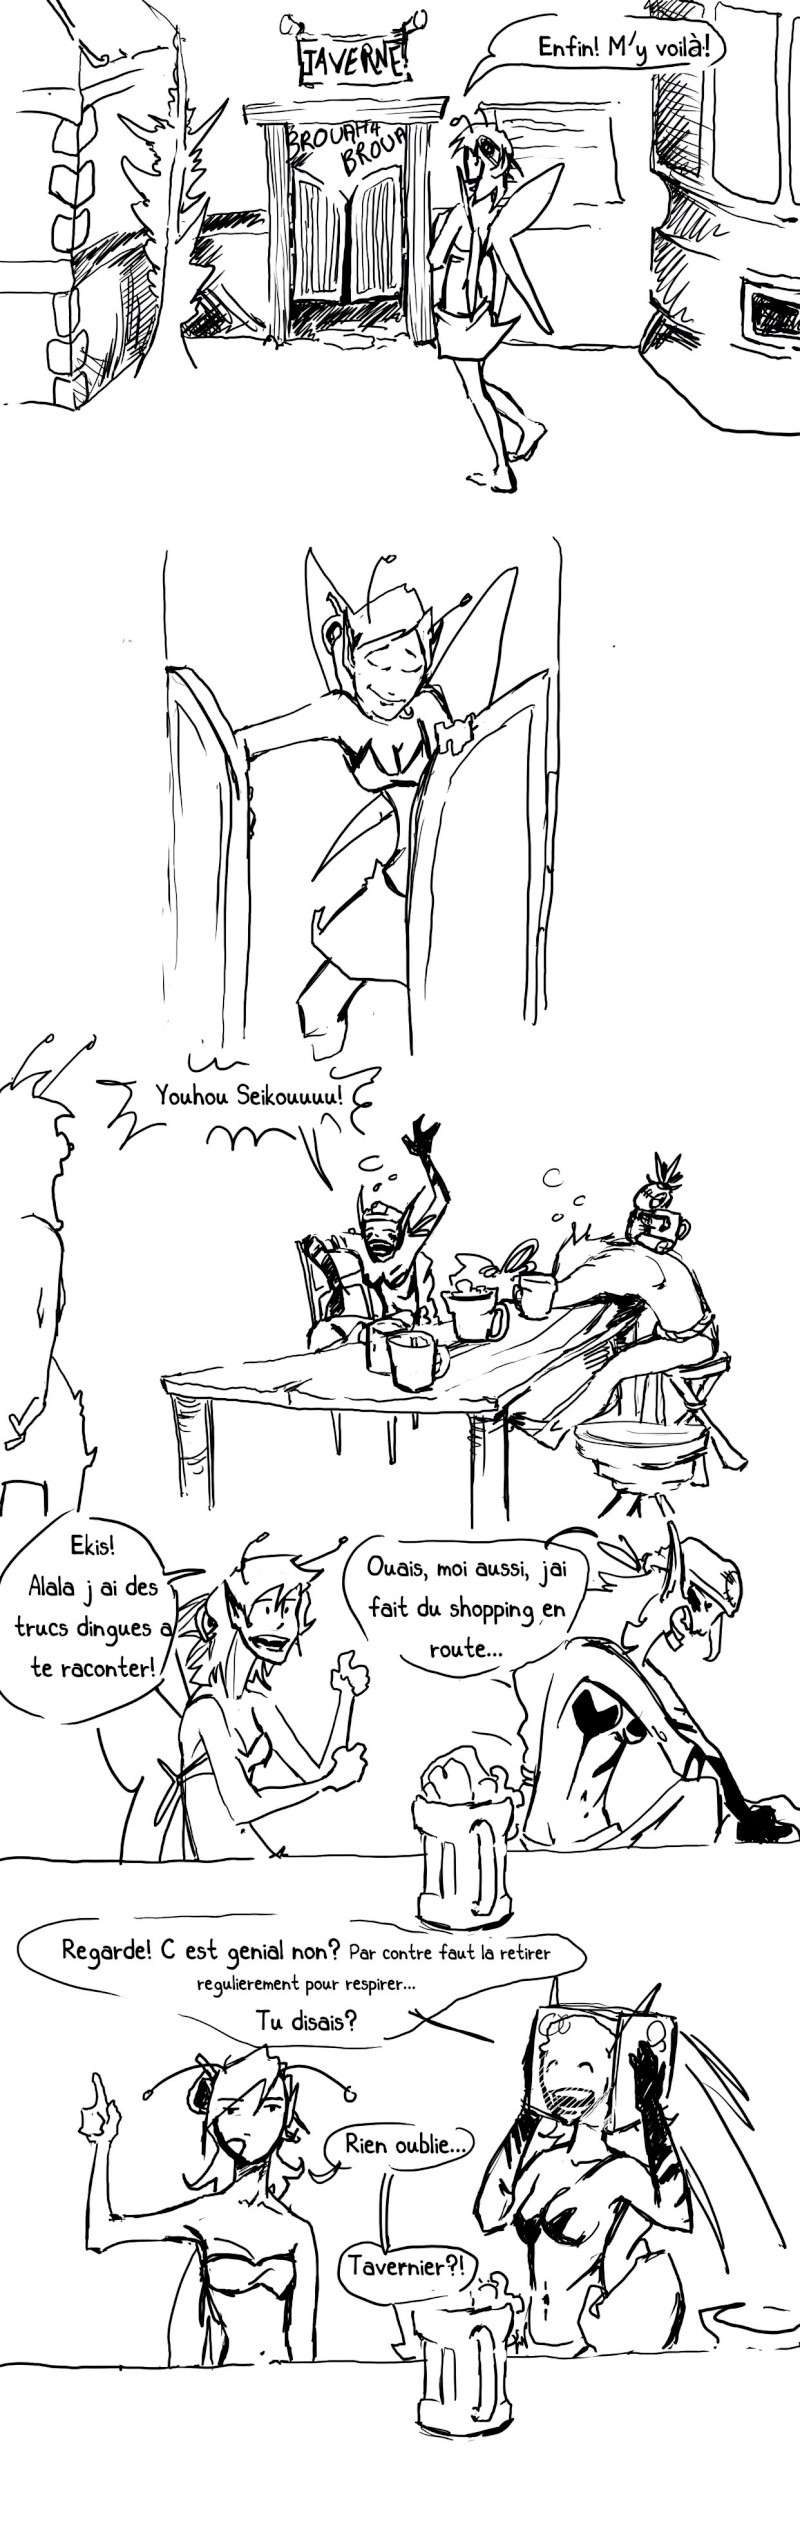 seik et ekis, les aventures ILLUSTREES - Page 4 Strip116